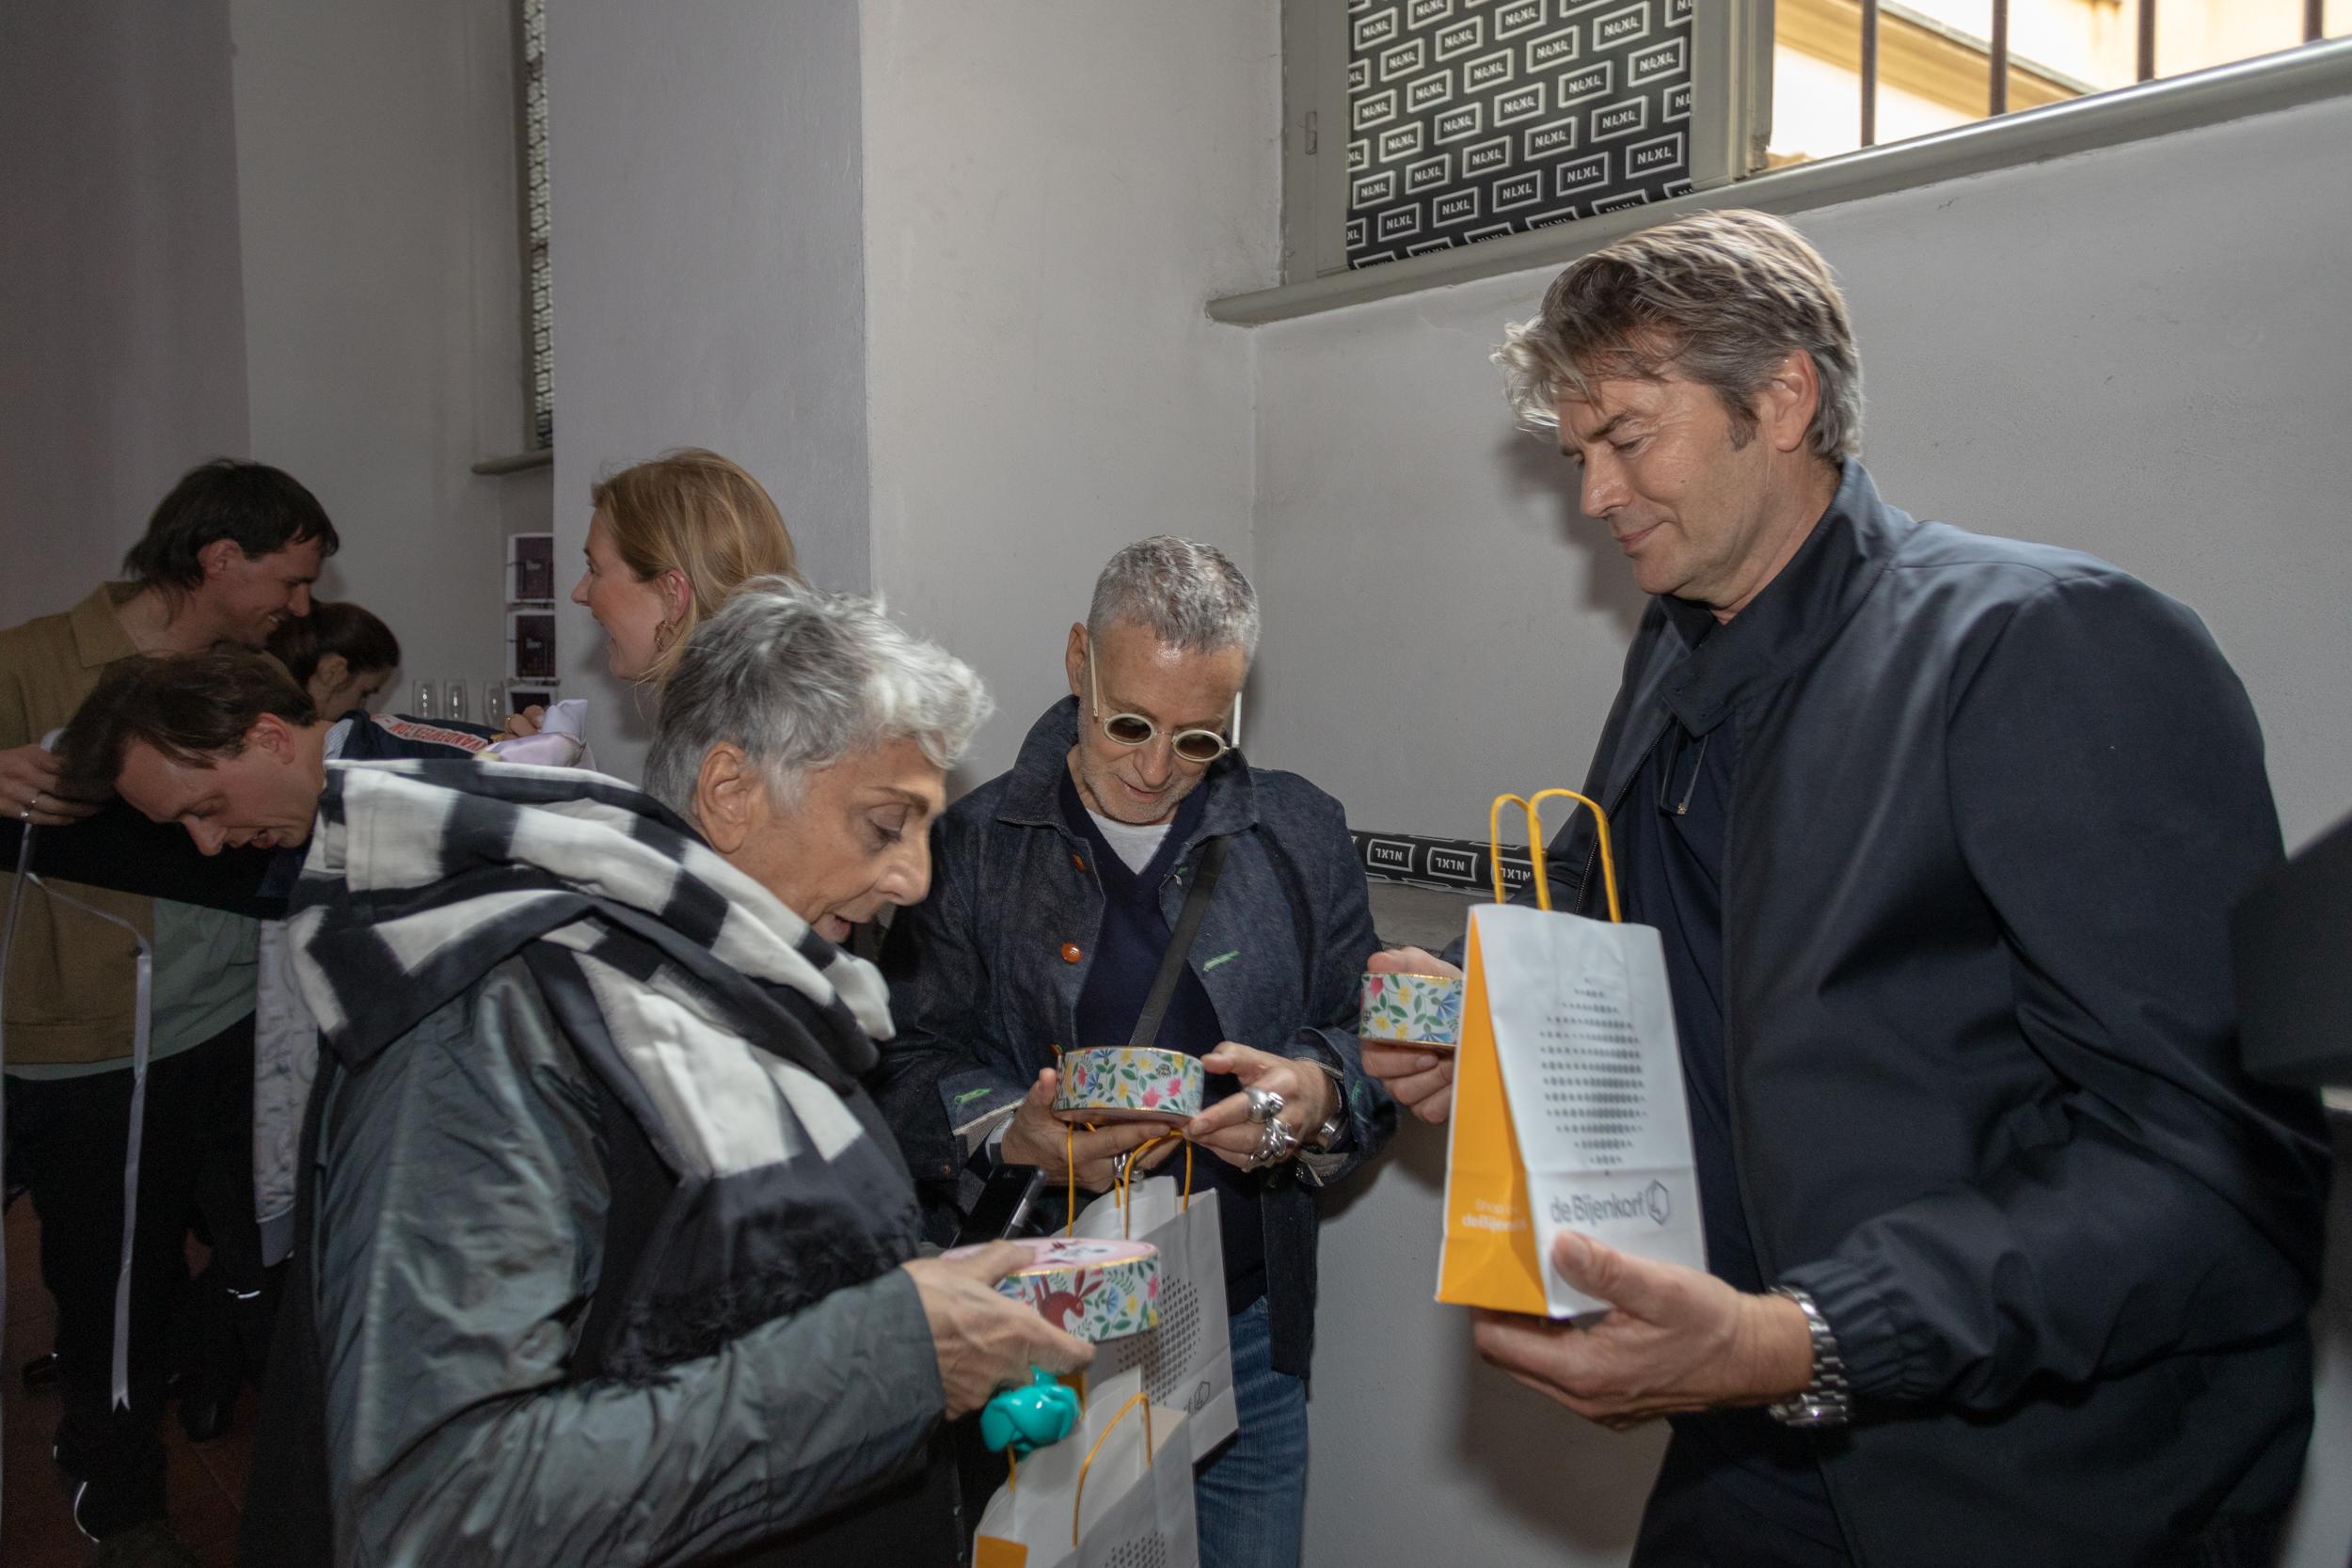 Cocktail party | Geomterics Wallpaper | NLXL Milan 2019-80.jpg